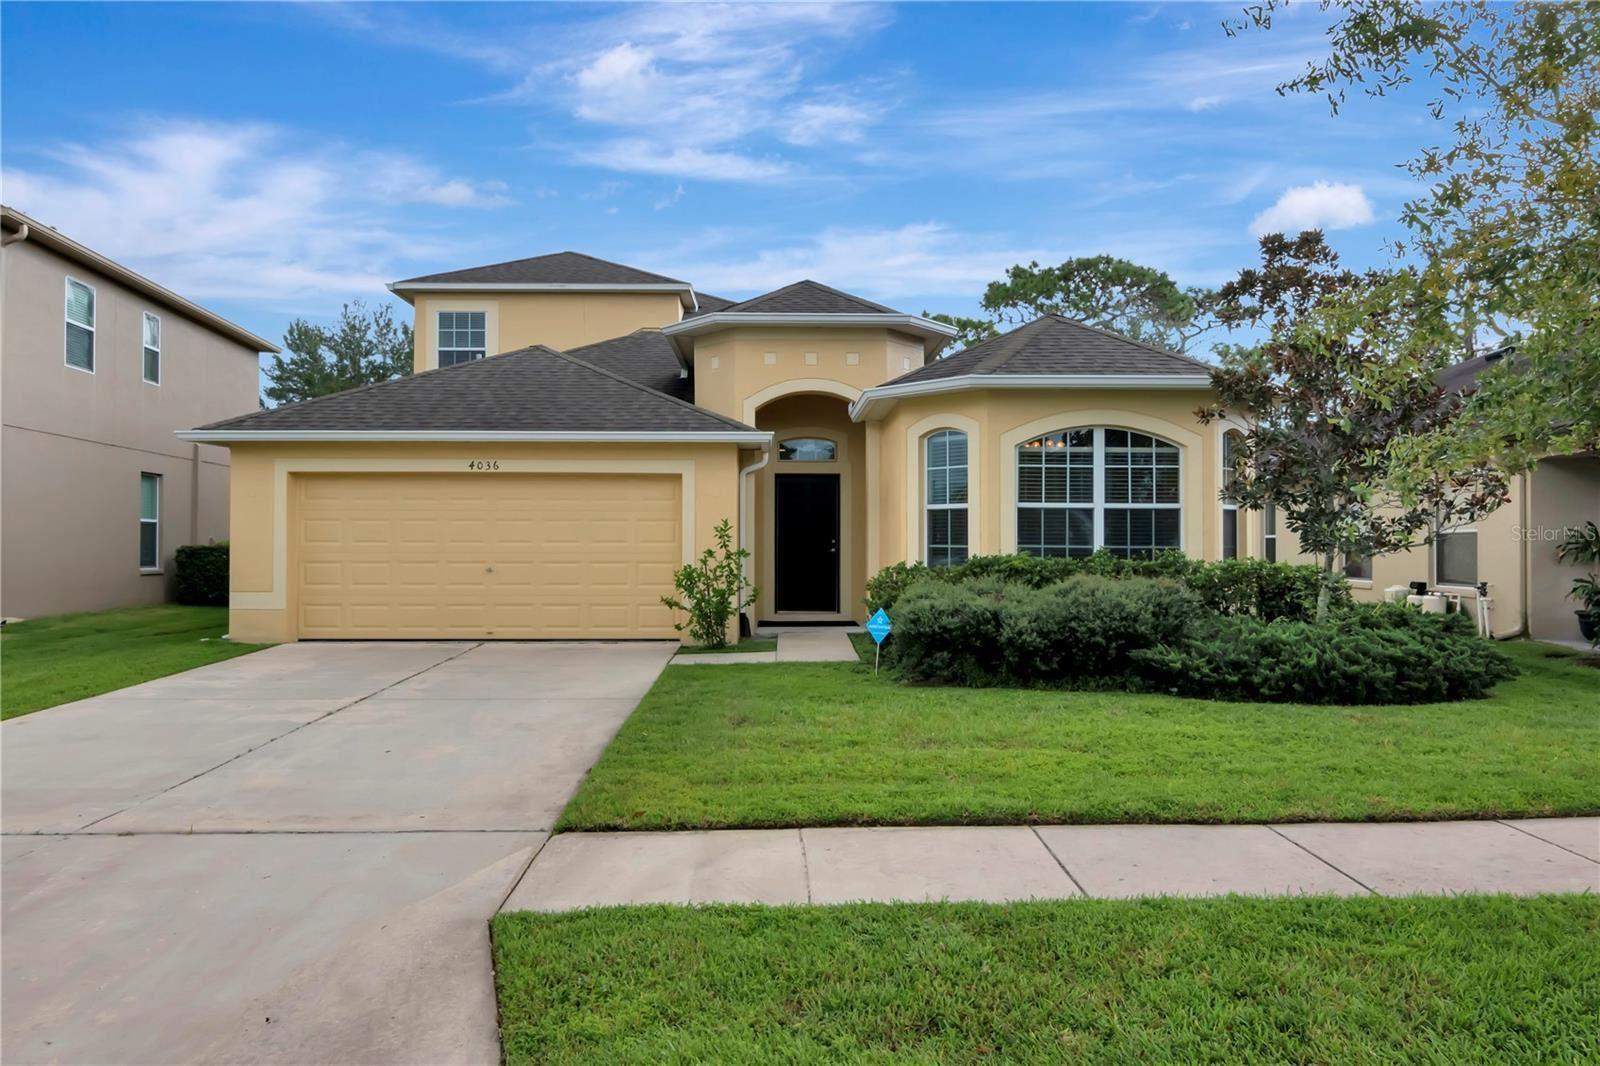 4036 WARWICK HILLS DRIVE, Wesley Chapel, FL 33543 - MLS#: T3330120